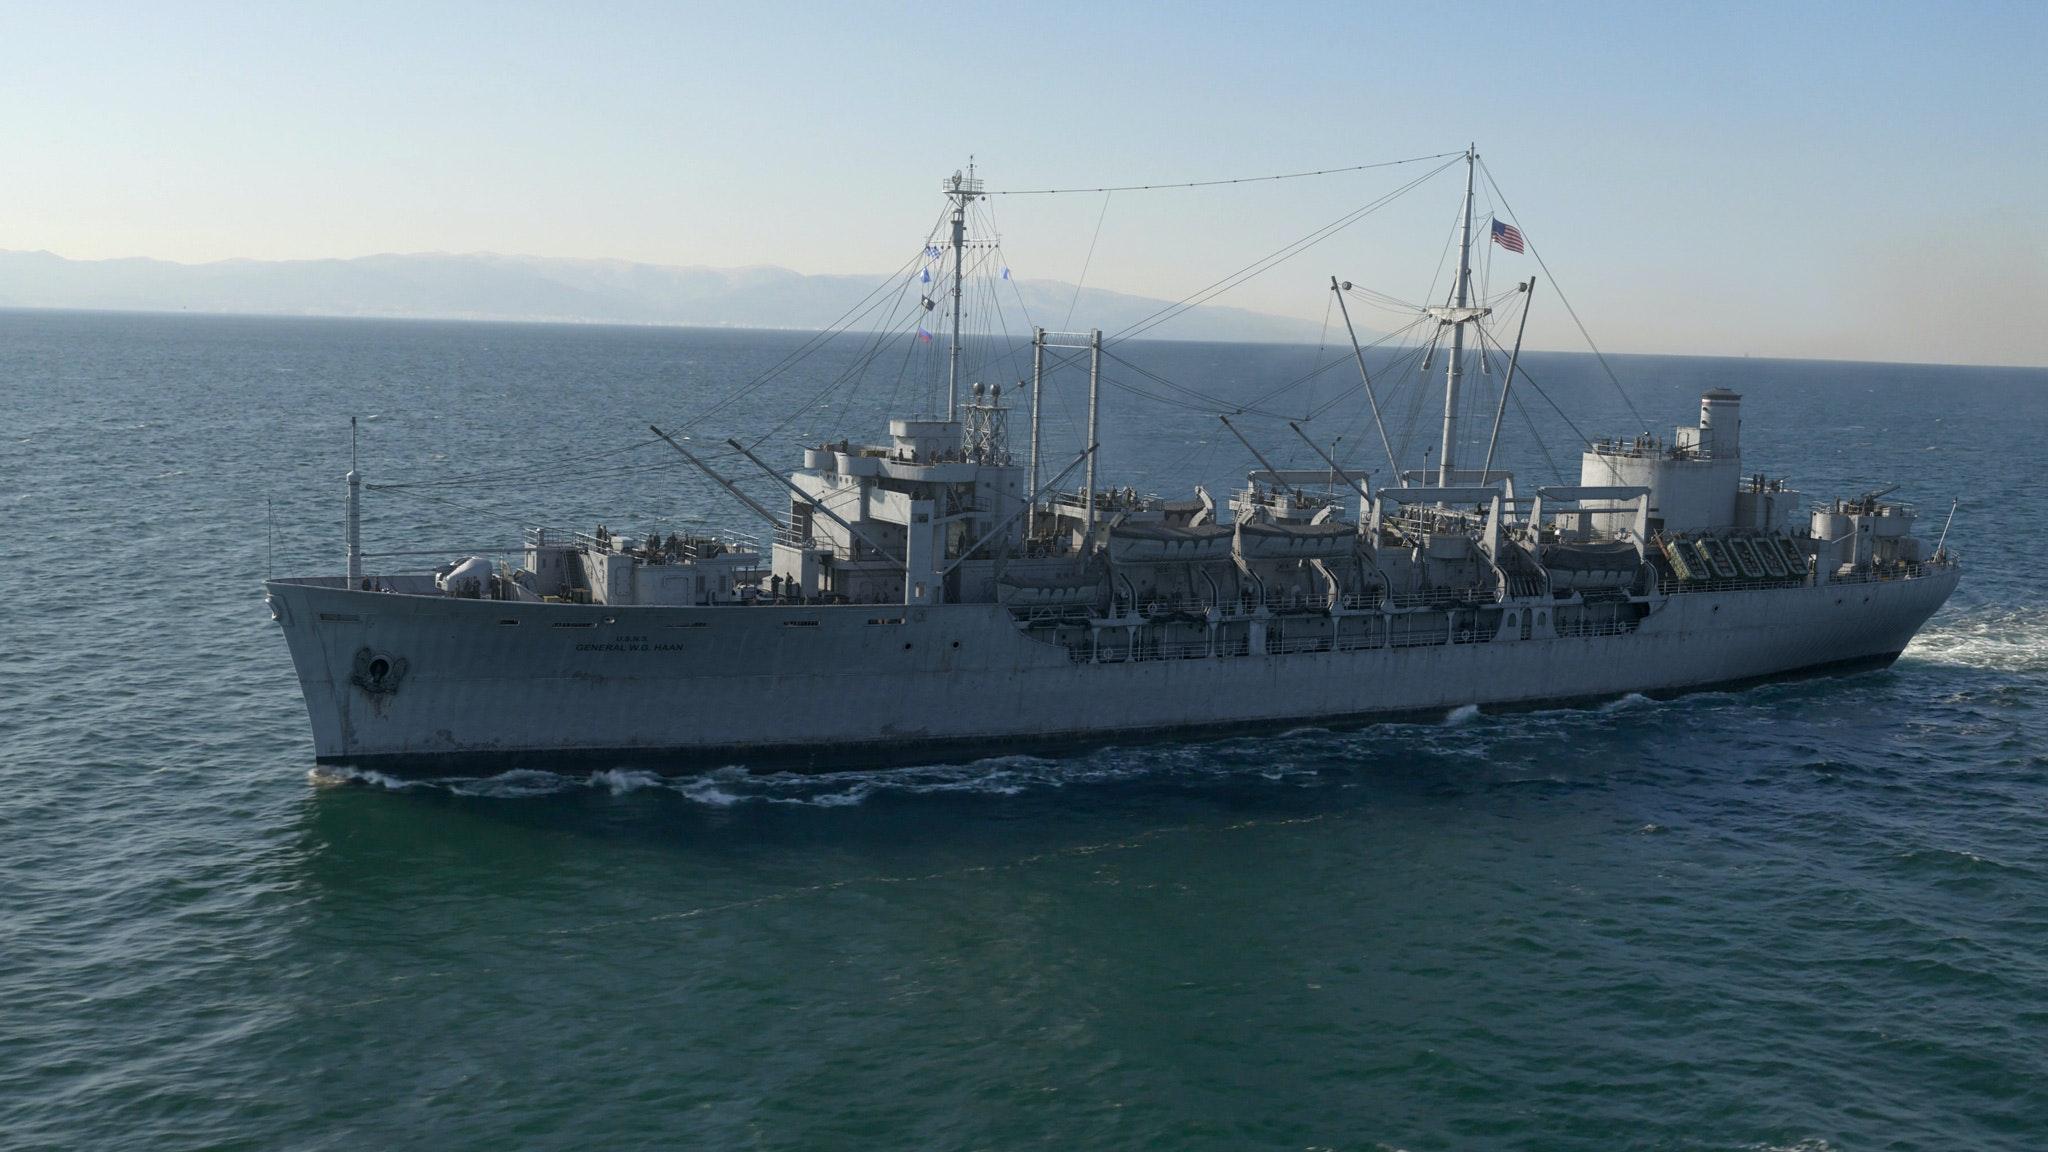 USS HAAN on the way to Korea